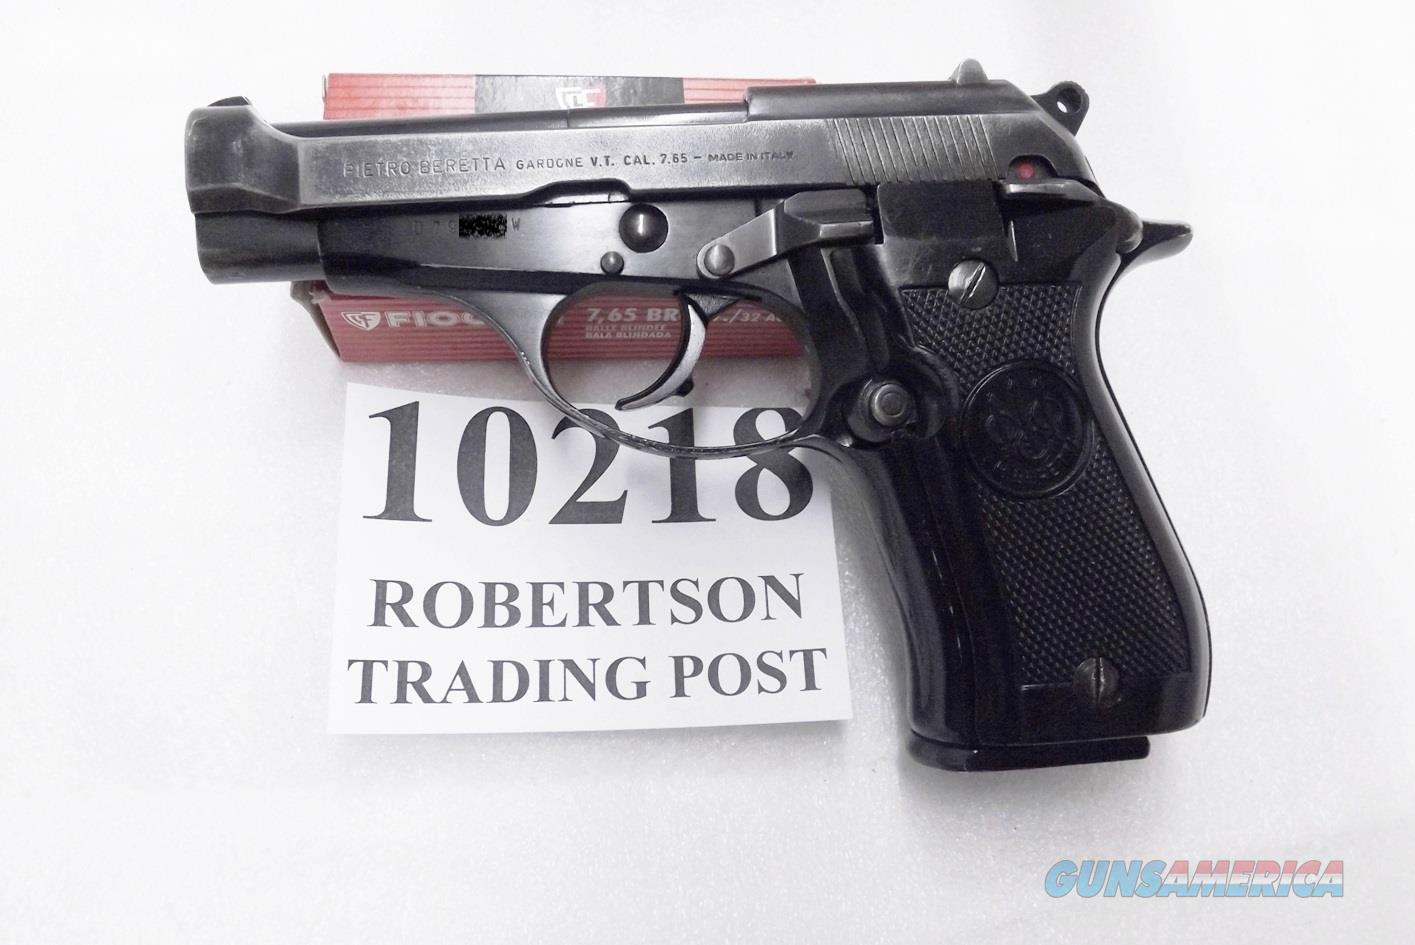 Beretta .32 ACP model 81 Cheetah 1981 Italian Corrections Issue VG Condition 1 – 12 Round Magazine J81F200M type $15 ship   Guns > Pistols > Beretta Pistols > Cheetah Series > Model 81